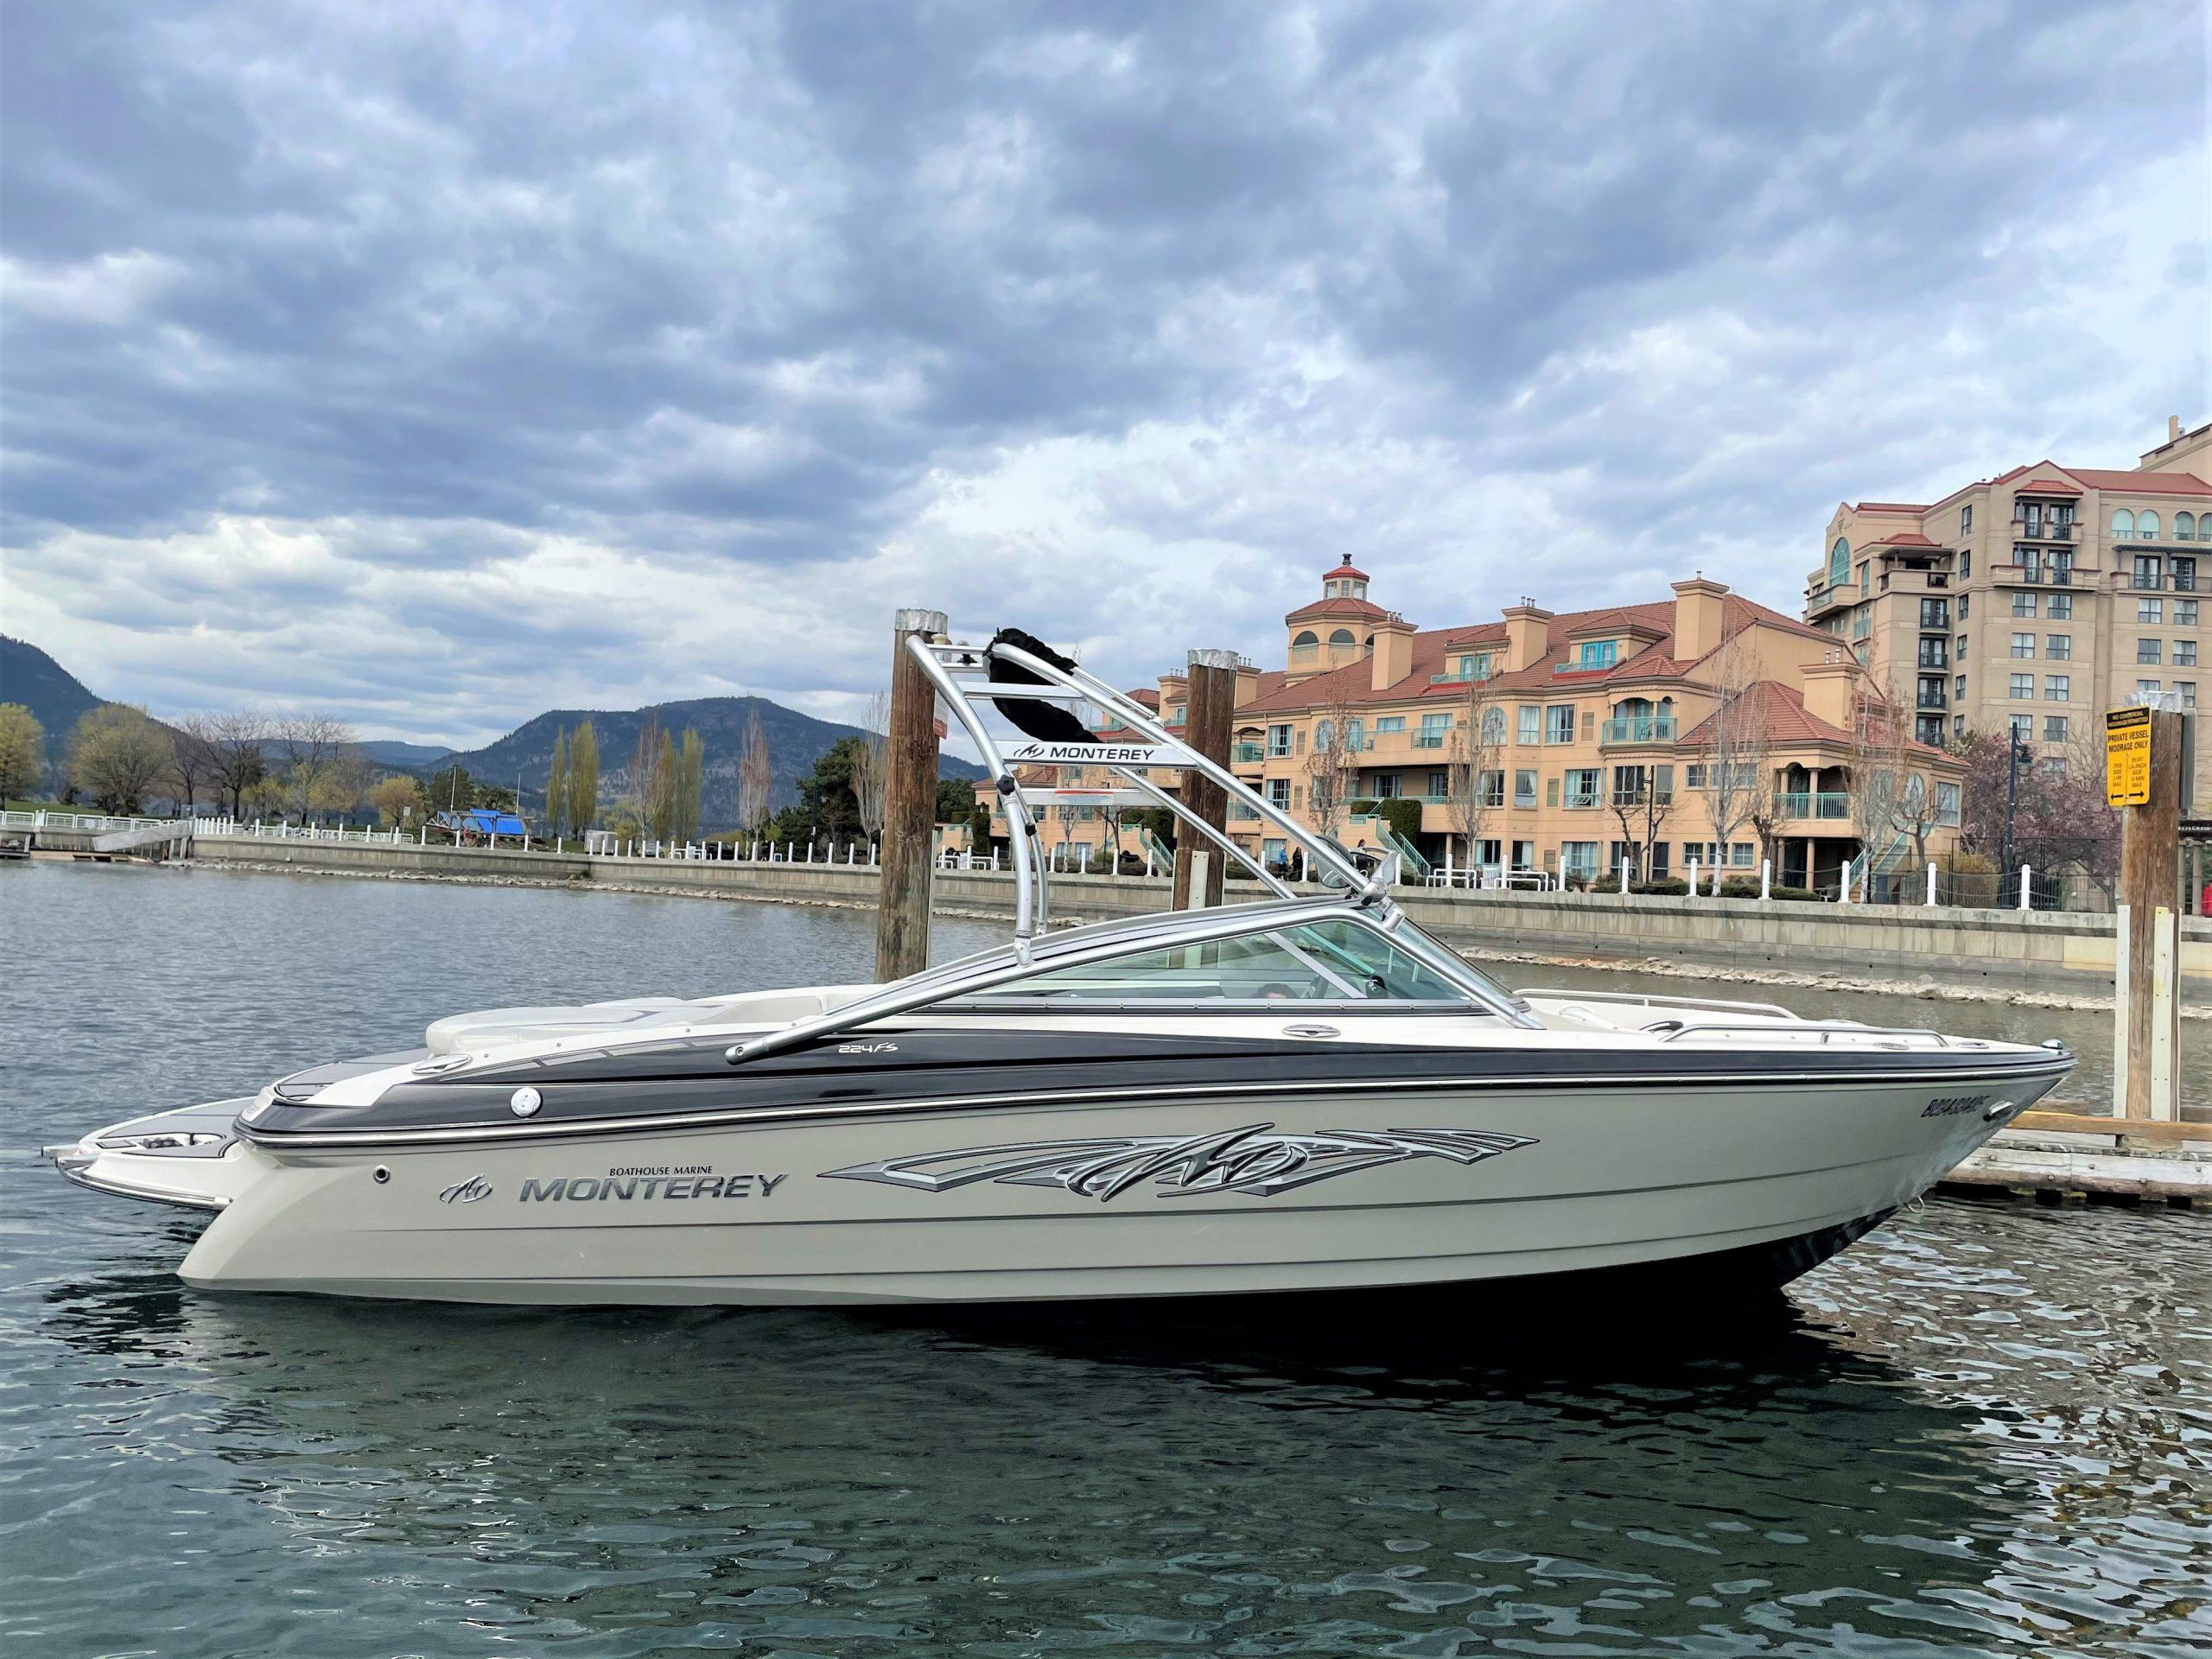 Glastron 20 foot long speedboat for rent.